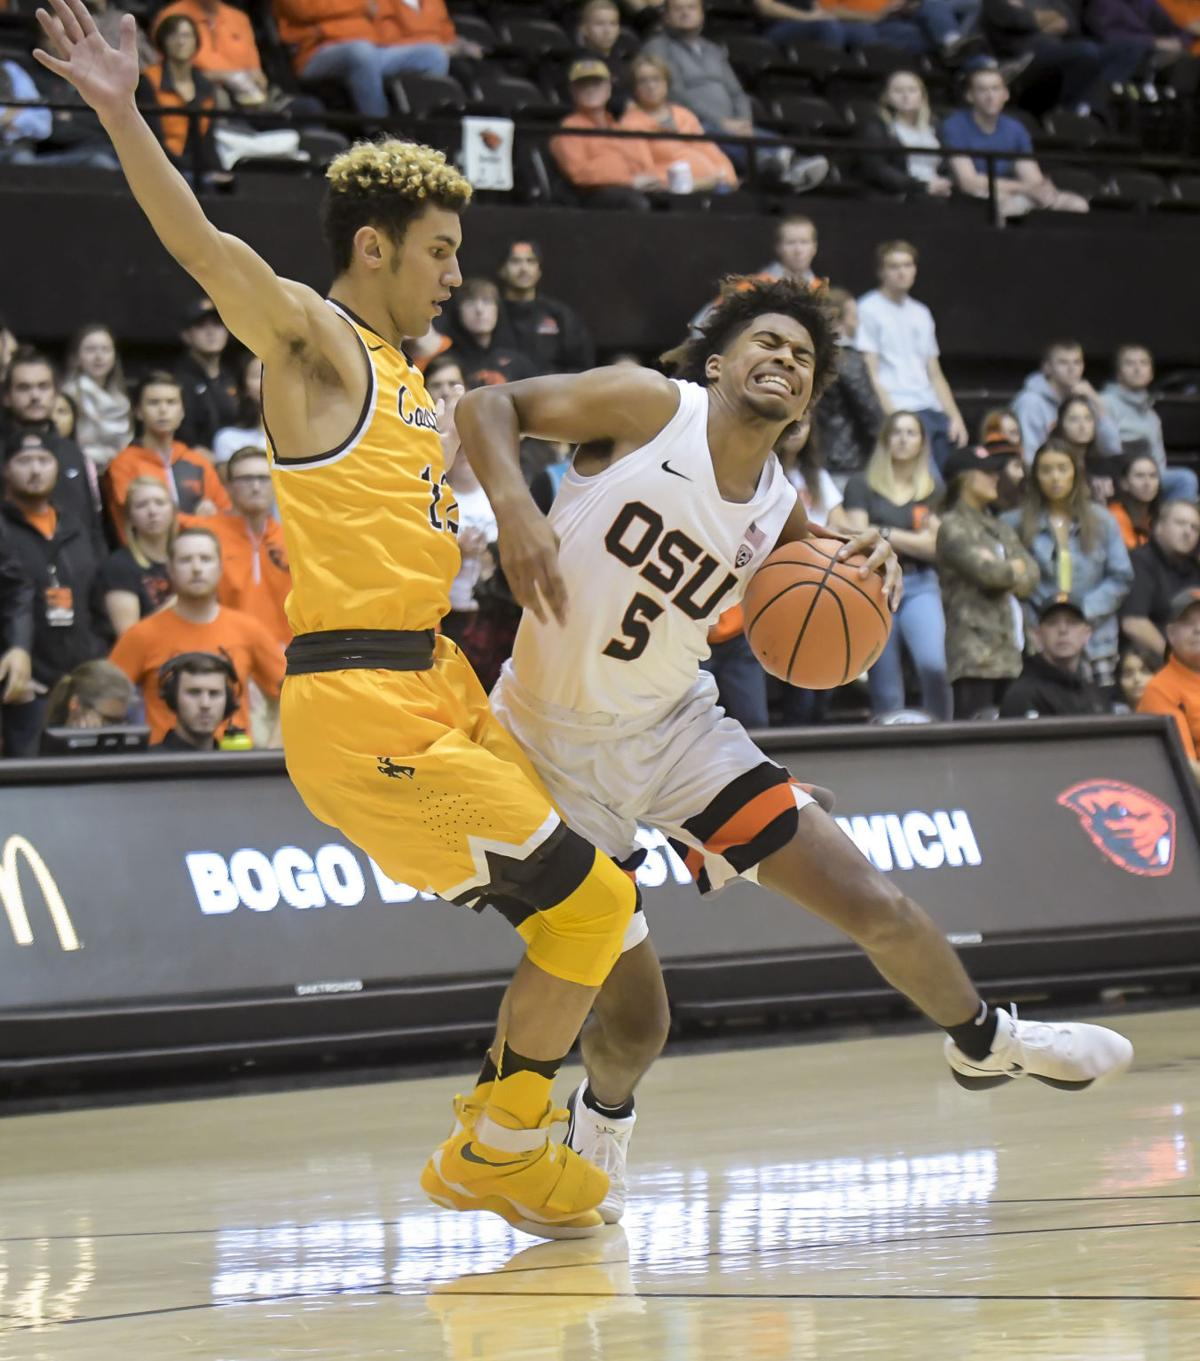 Gallery: OSU vs Wyoming basketball 01